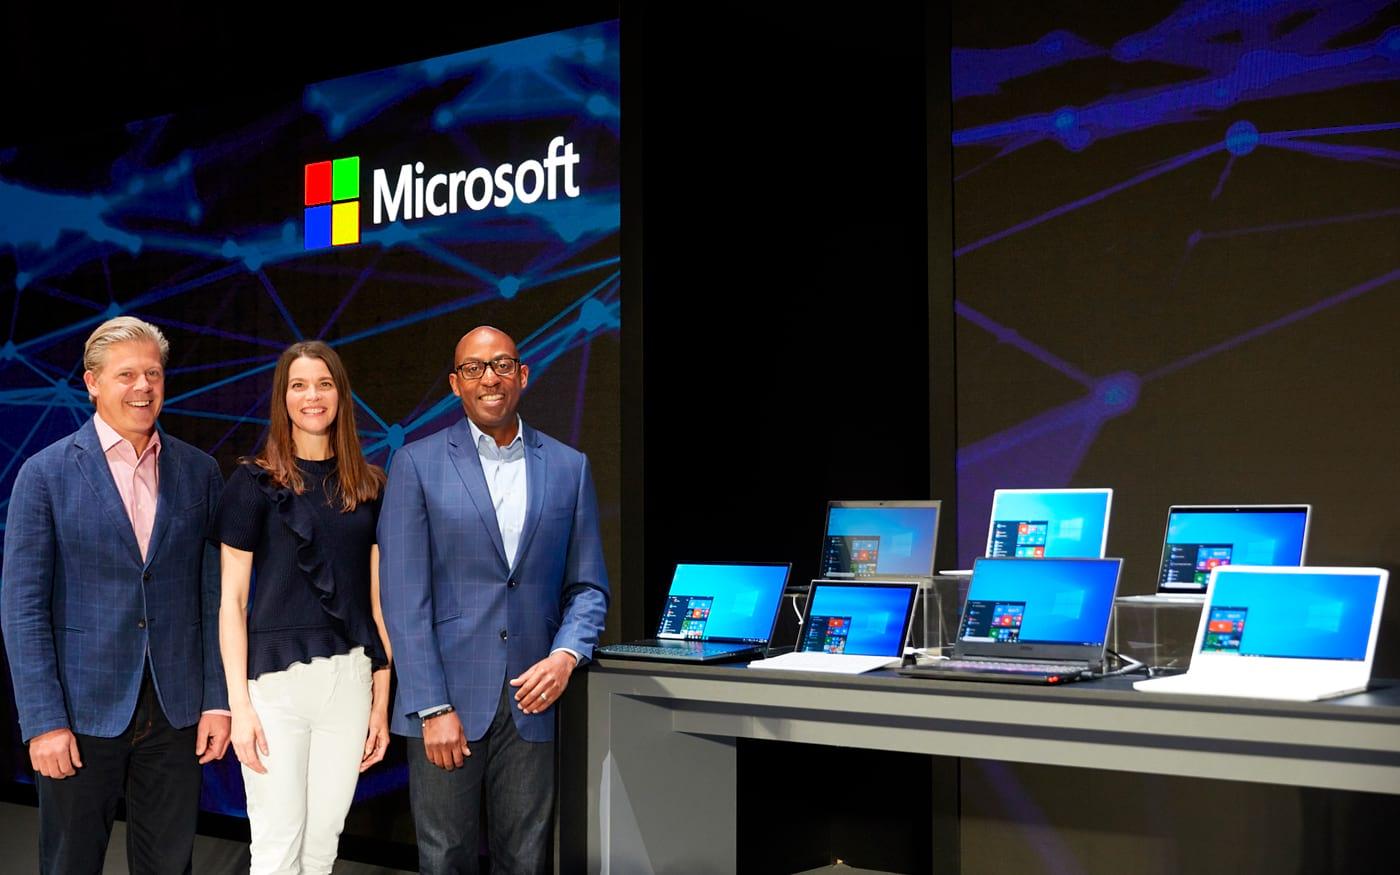 Microsoft começa a consolidar a ideia por trás do 'Windows Core OS' na Computex 2019